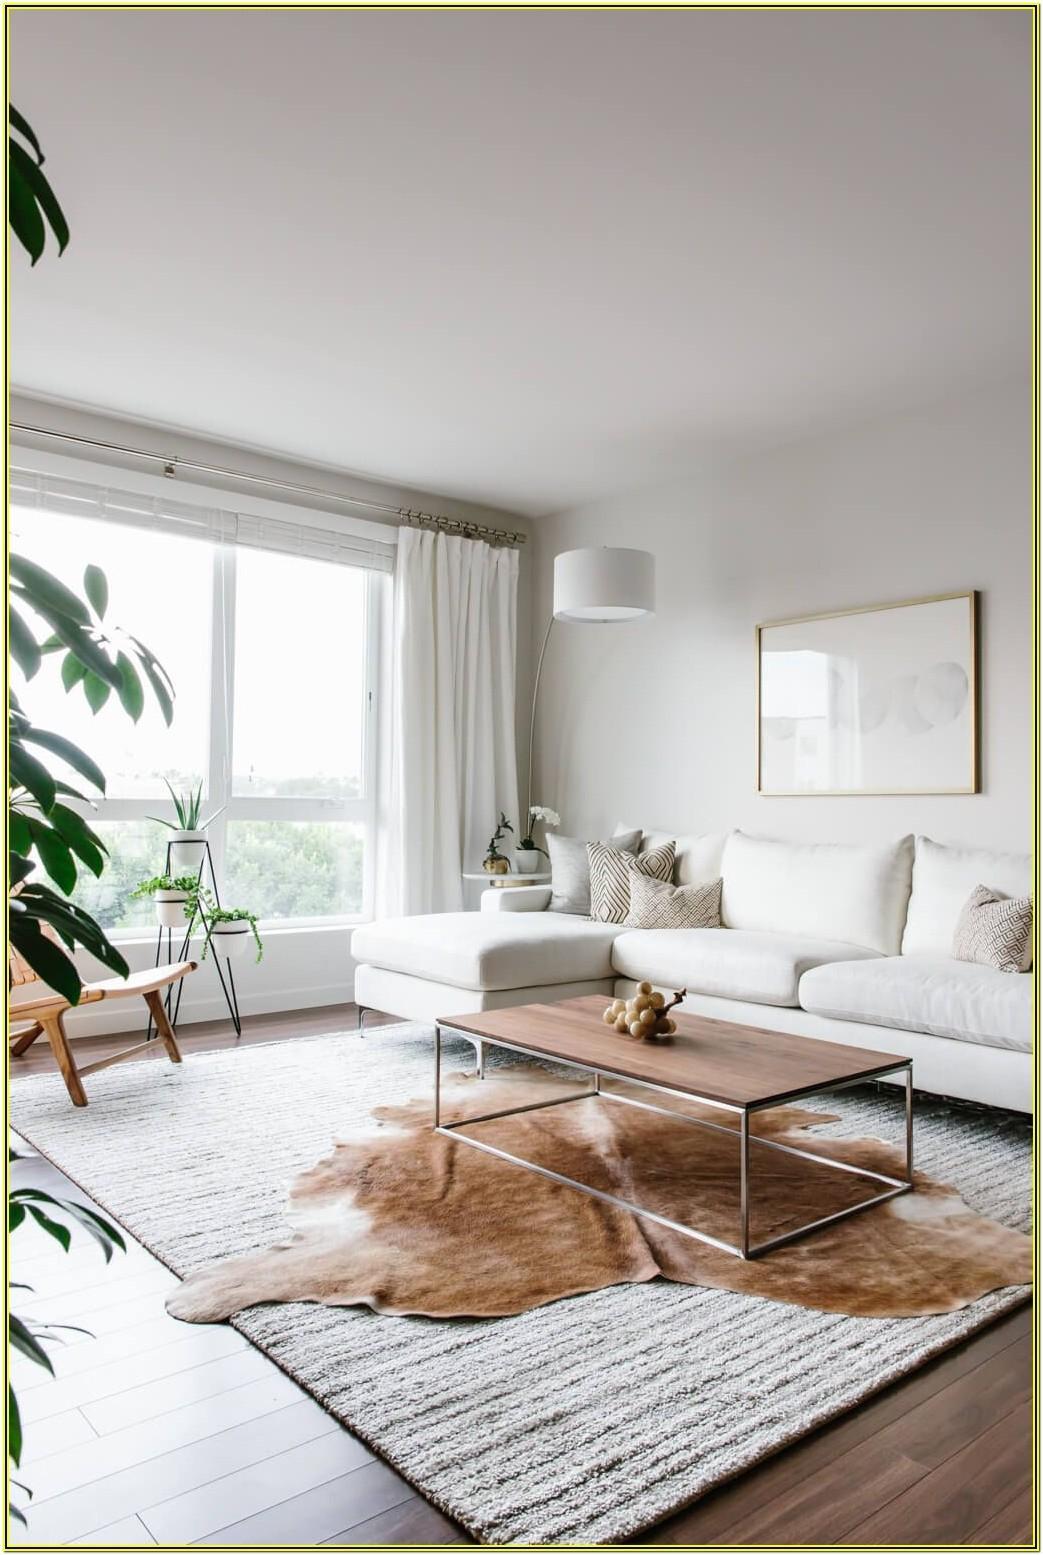 Living Room Minimalist House Interior Design